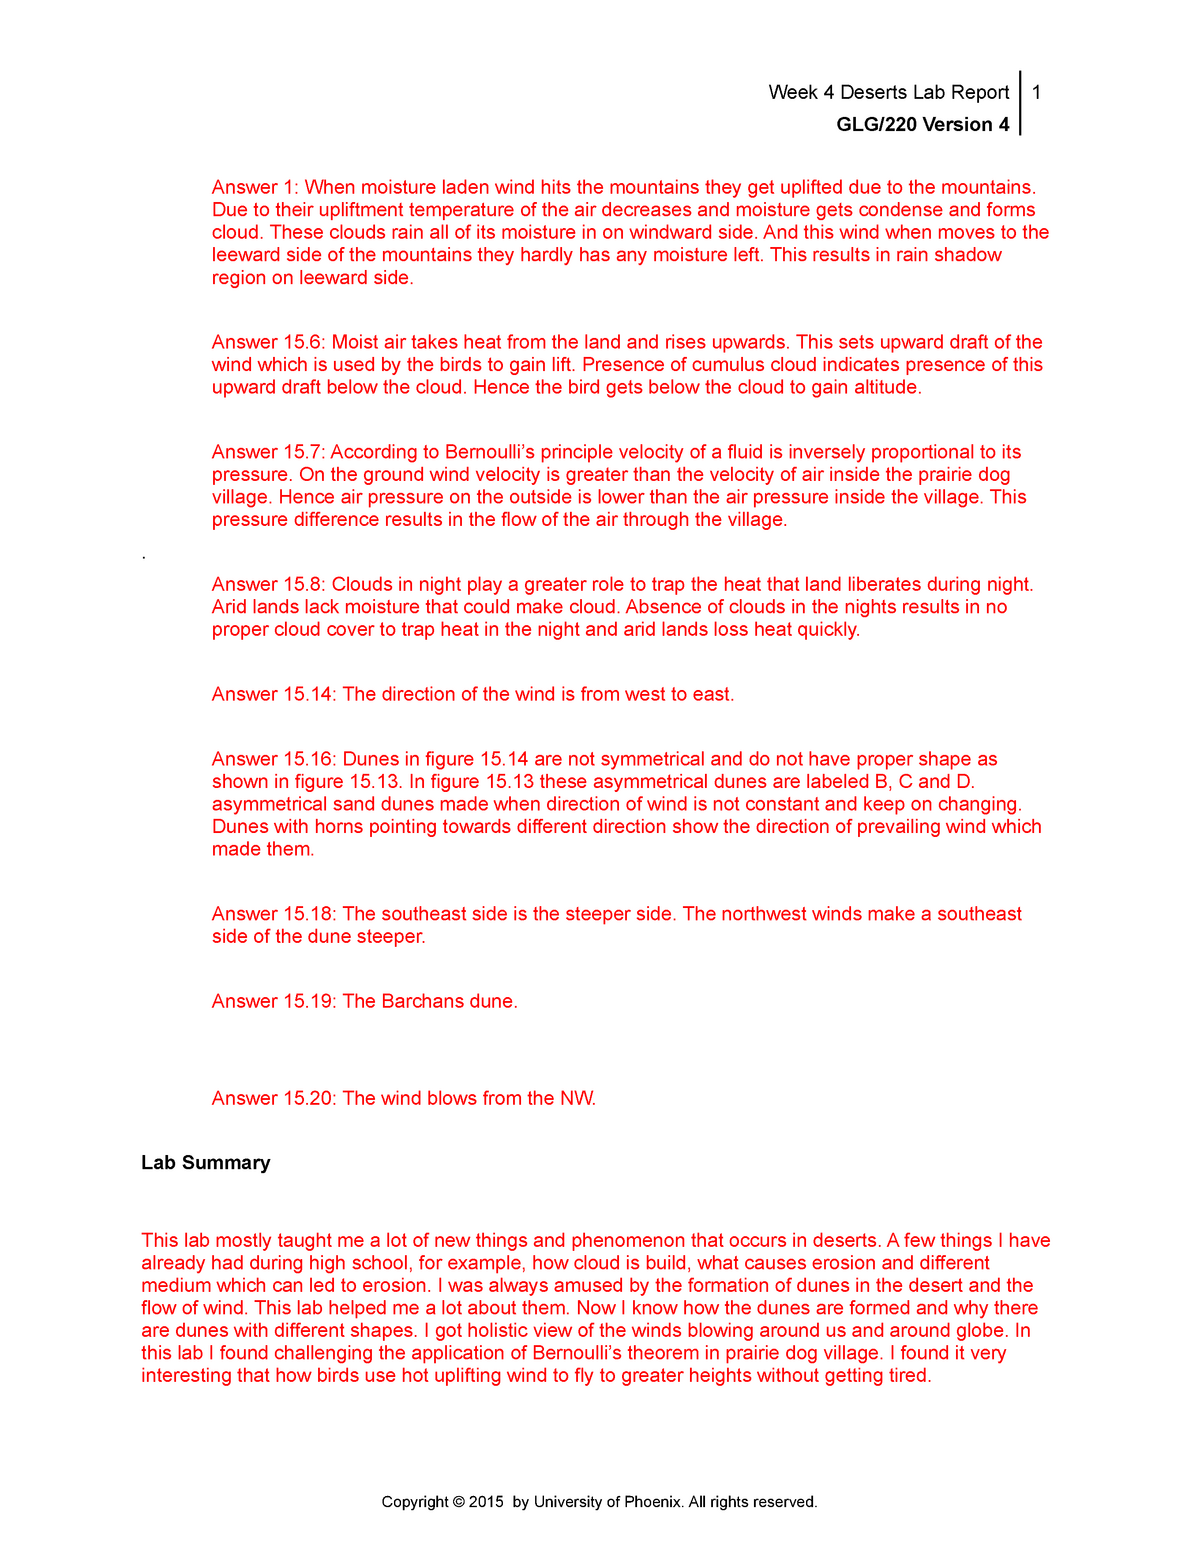 2813173 1 glg220-r4-wk4-deserts-lab-report - PPE: Politics